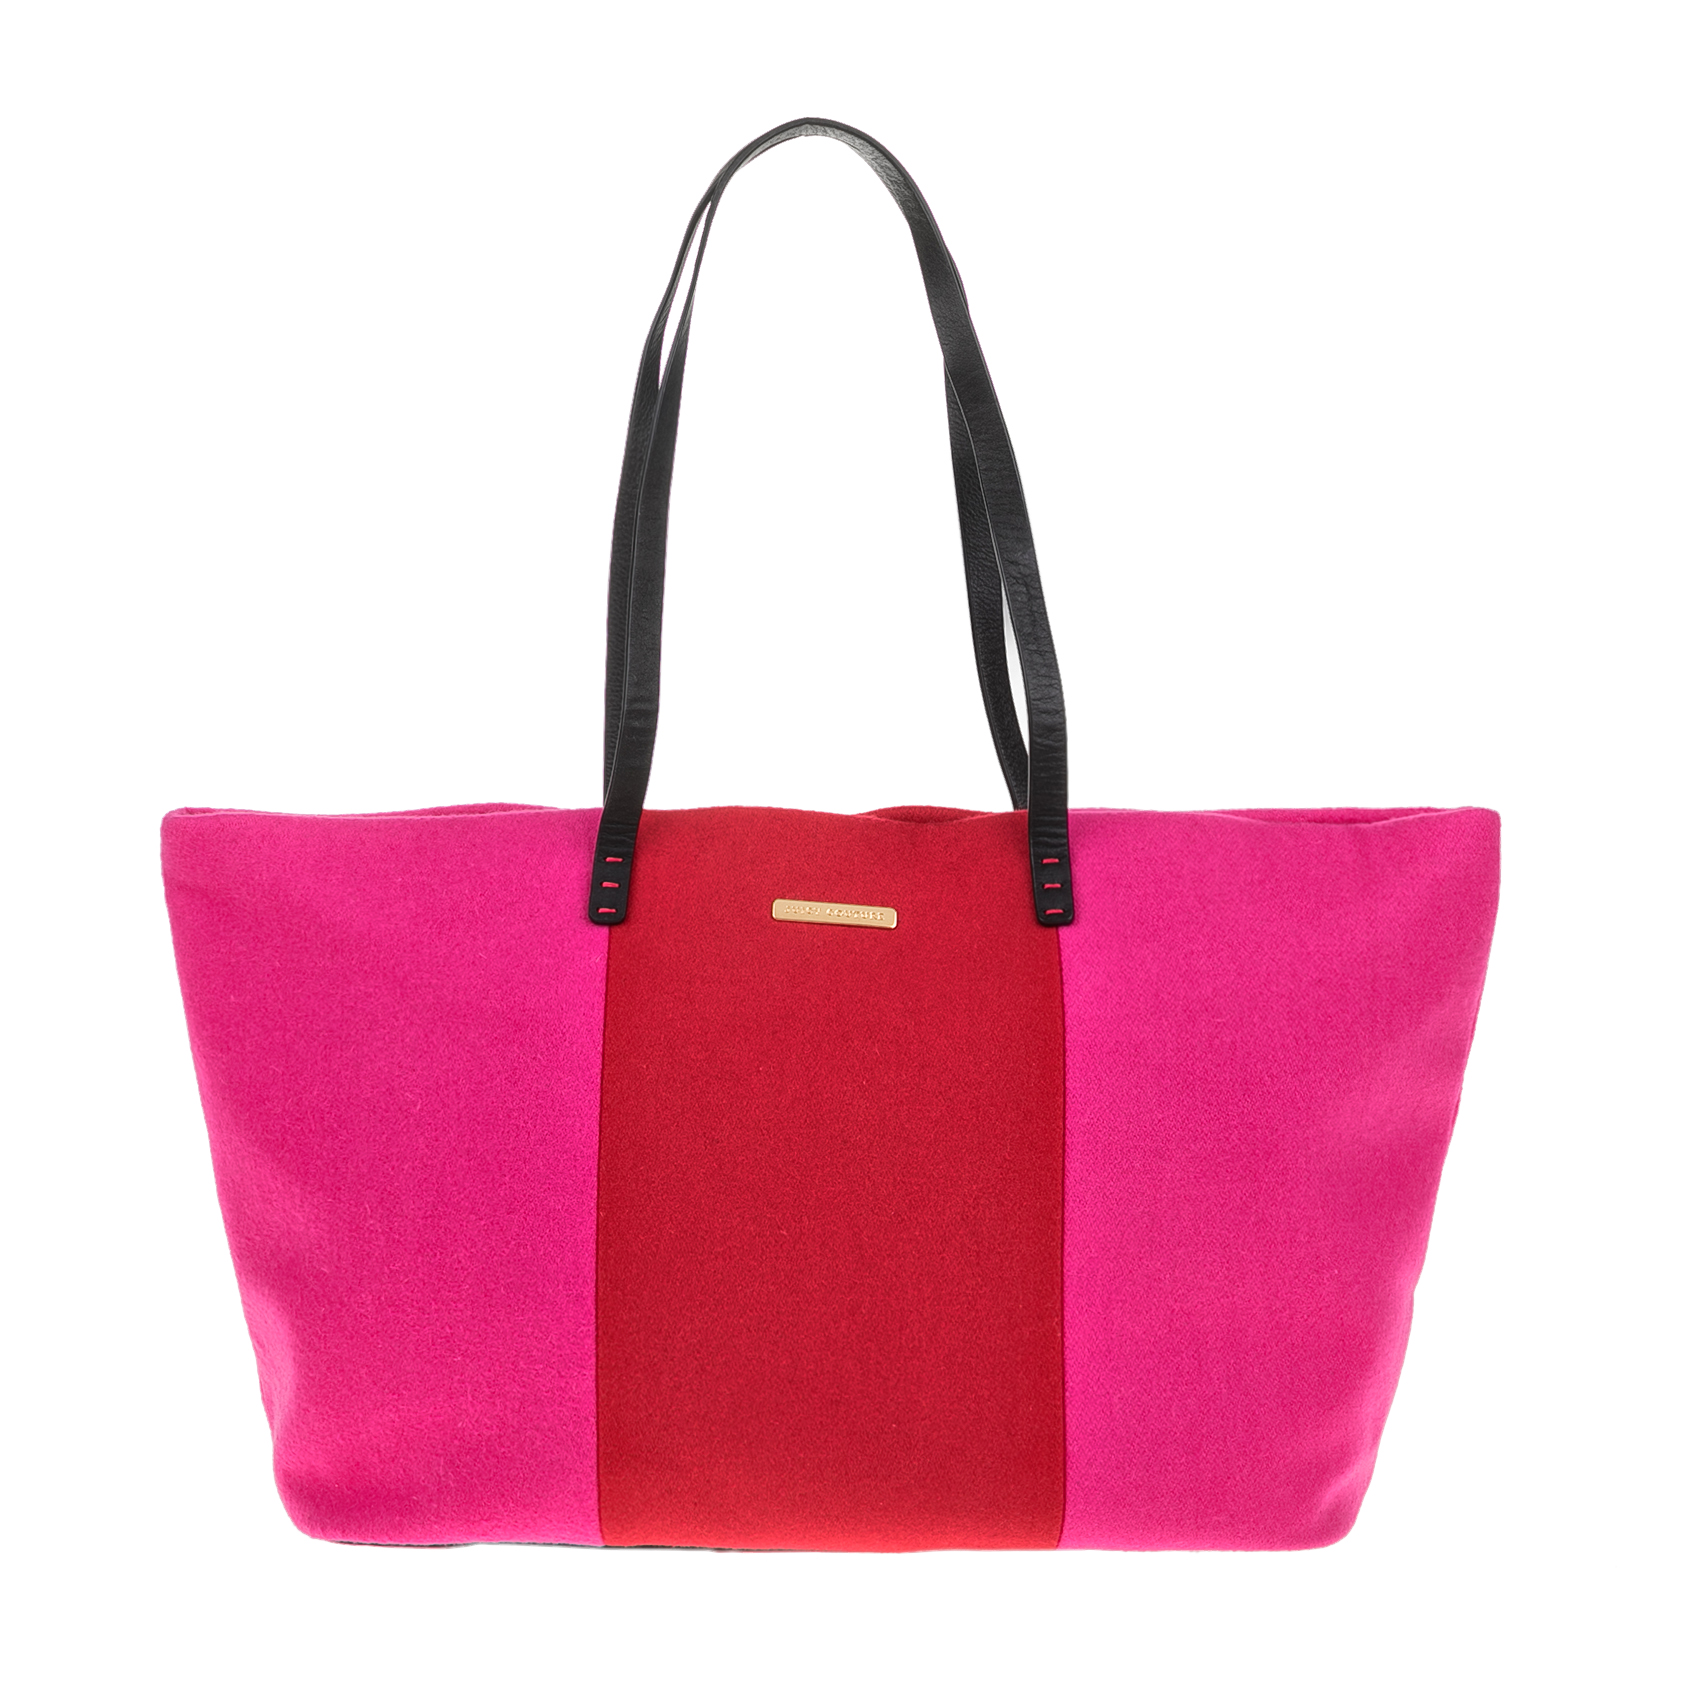 JUICY COUTURE – Γυναικεία τσάντα JUICY COUTURE EXCLUSIVE MONOGRAM ροζ-κόκκινη 1427951.0-F145